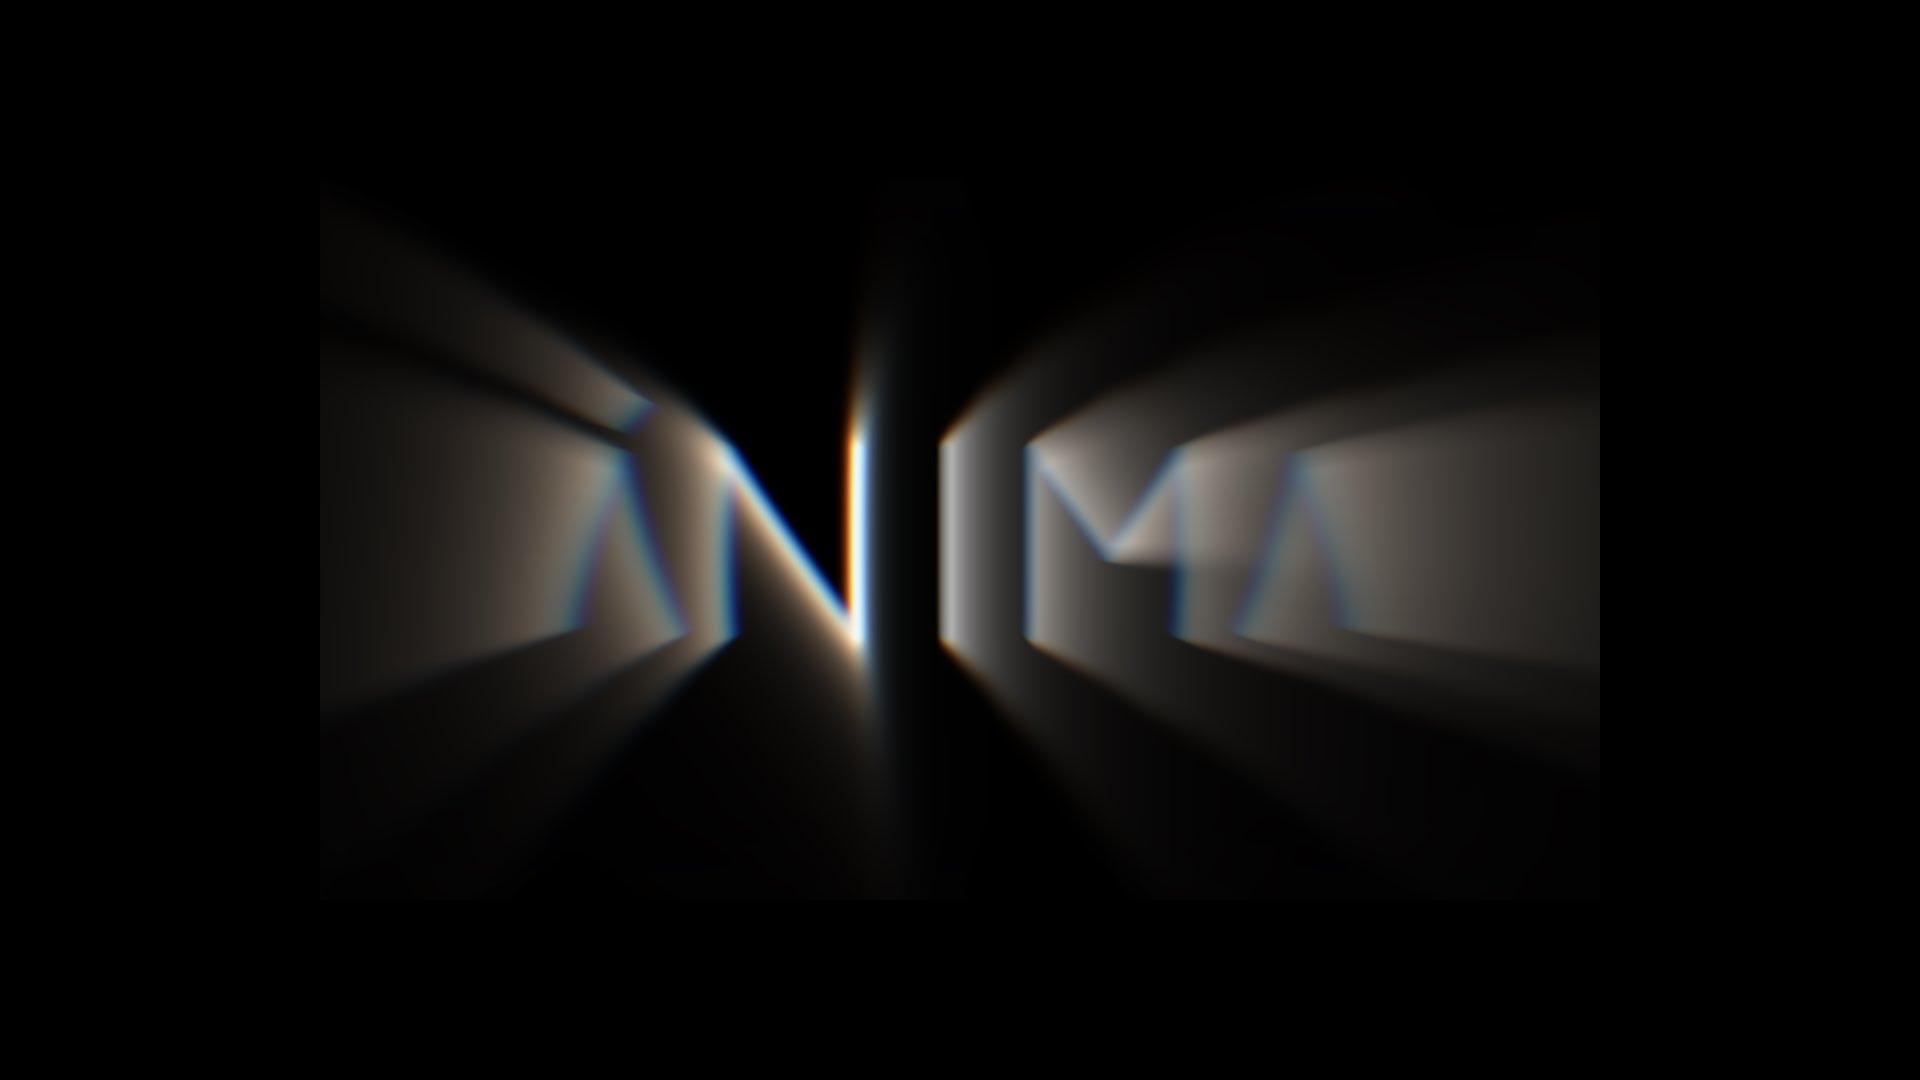 Las múltiples posibilidades para disfrutar de ÁNIMA 360º